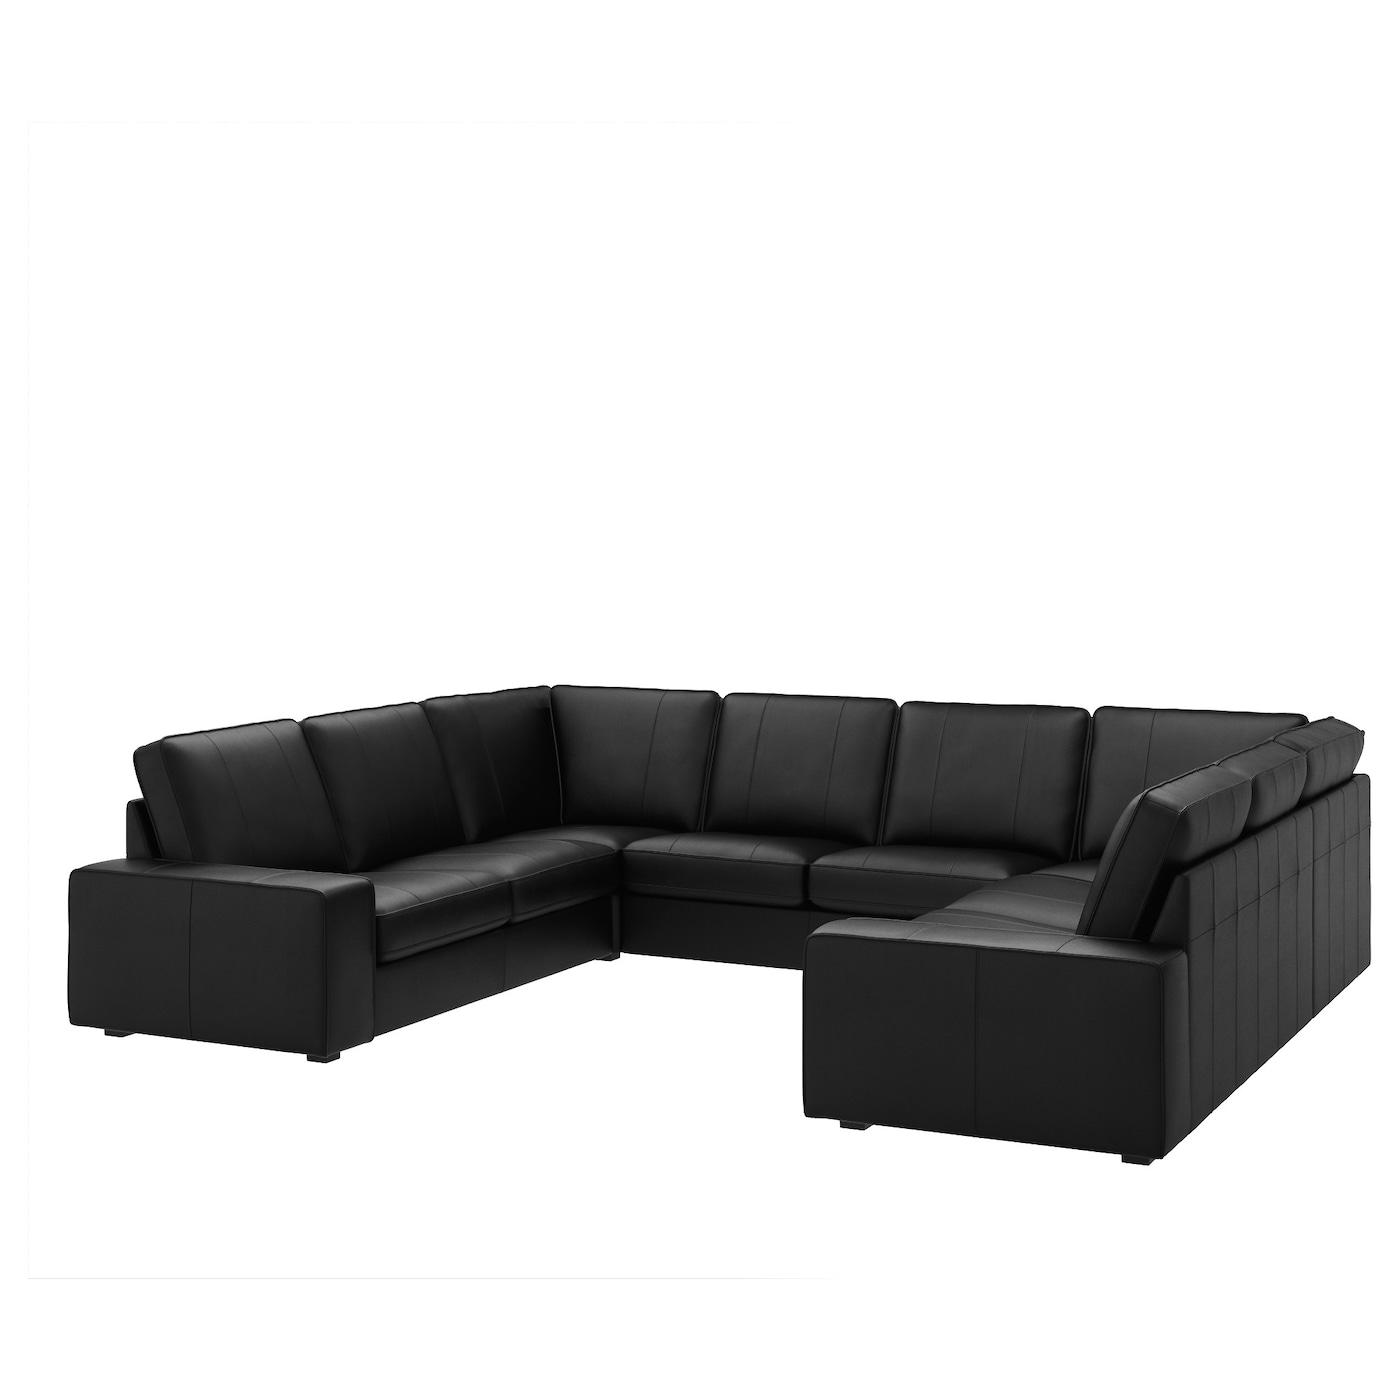 Beautiful IKEA KIVIK U Shaped Sofa, 6 Seat 10 Year Guarantee. Read About The